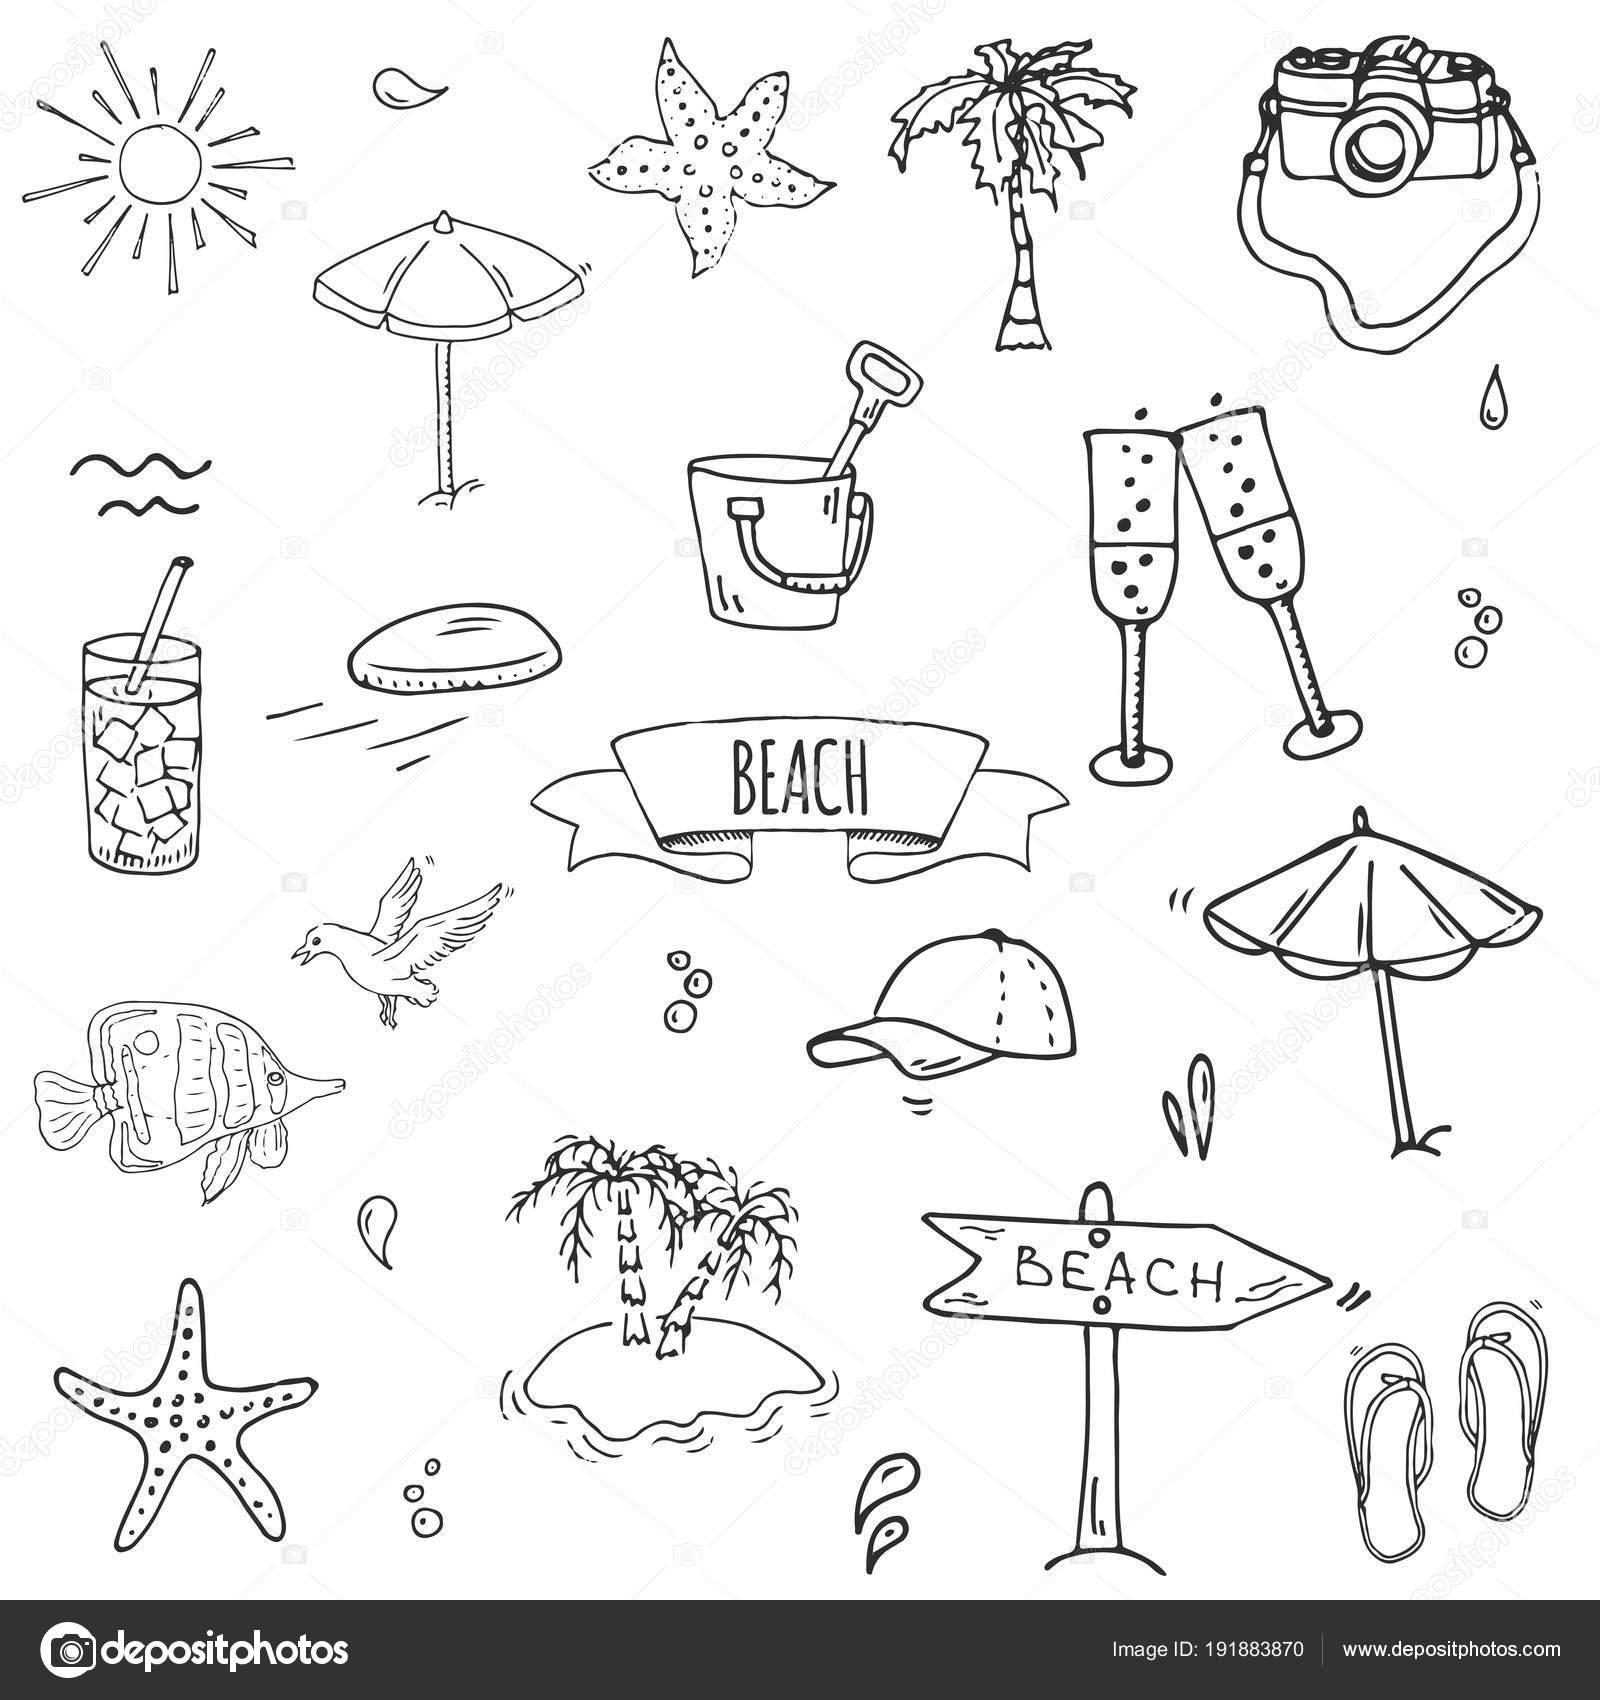 Objetos Playa Para Colorear Dibujado Mano Doodle Playa Set Iconos